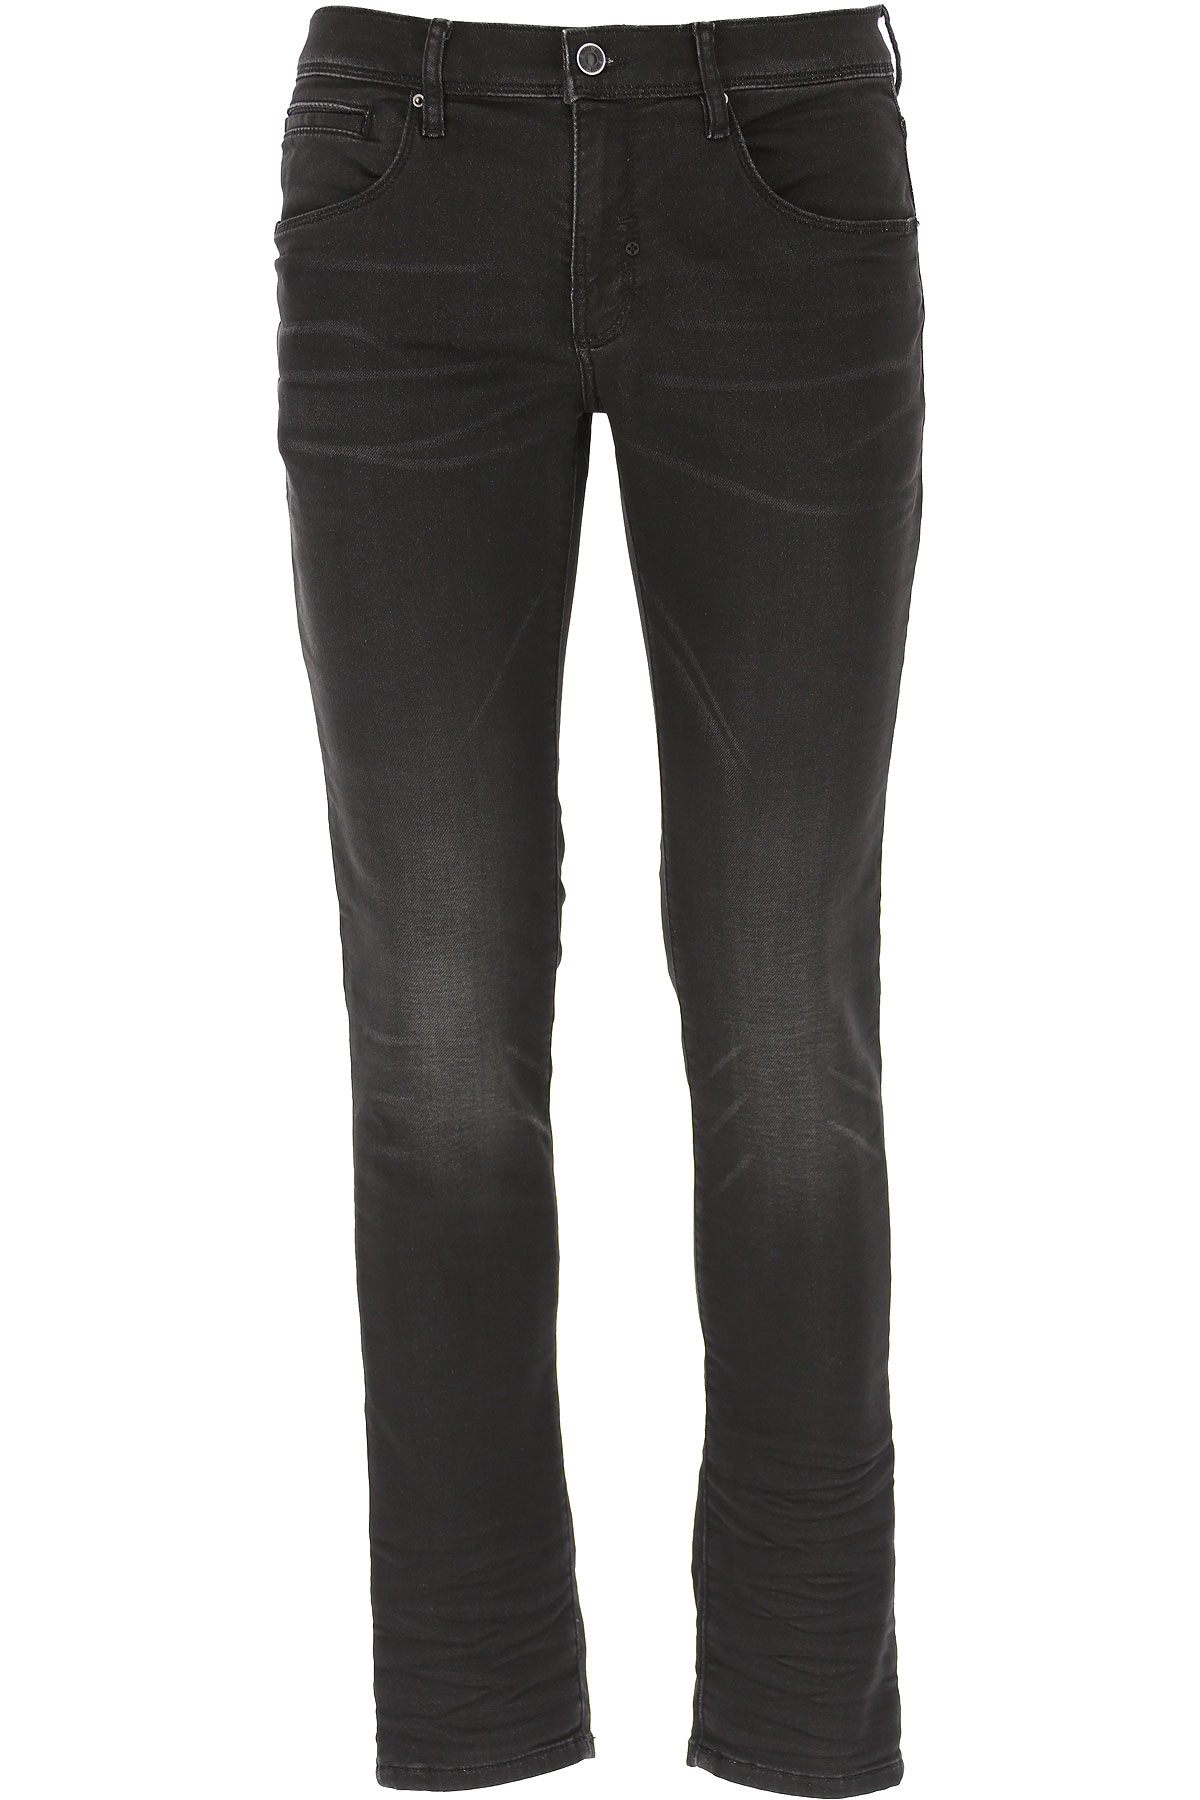 Antony Morato Jeans On Sale, Black, Cotton, 2019, 32 34 36 38